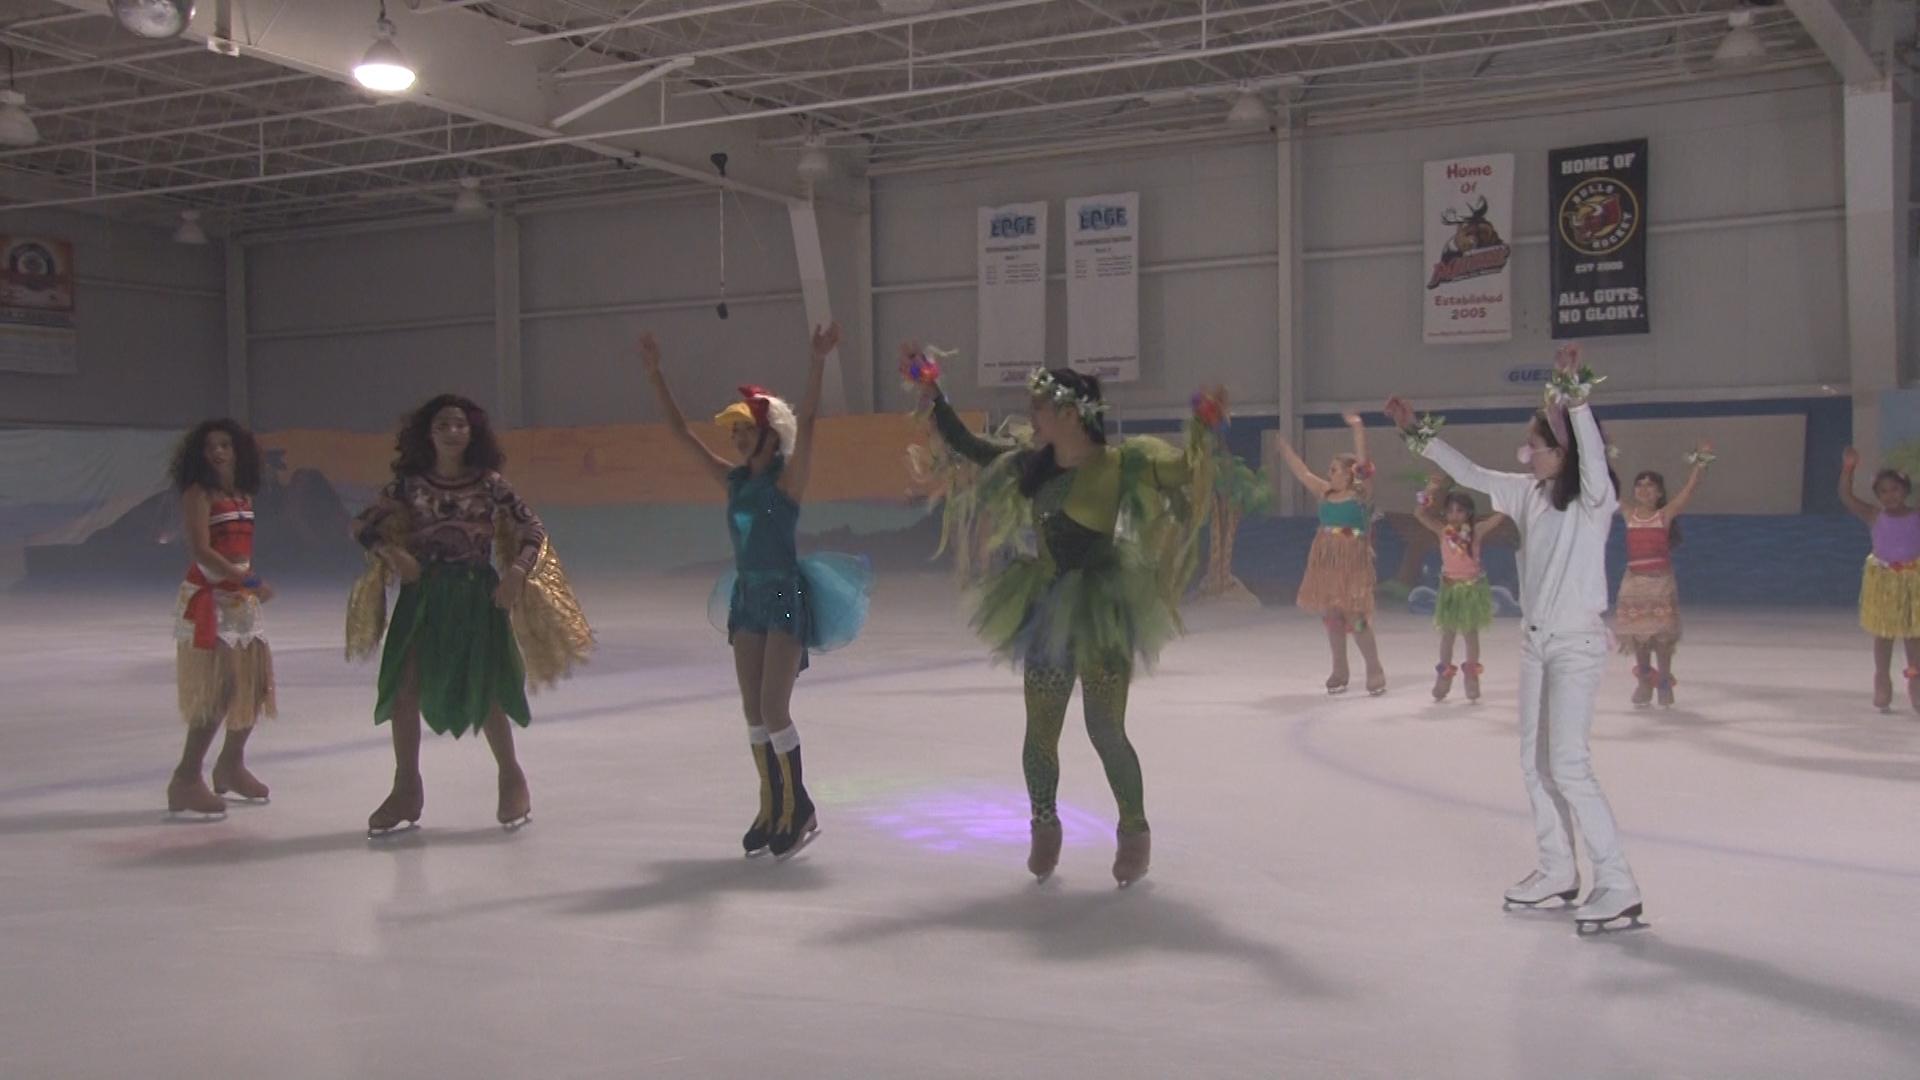 Power Play Maui Skate on Ice 071417.00_56_38_25.Still086.jpg